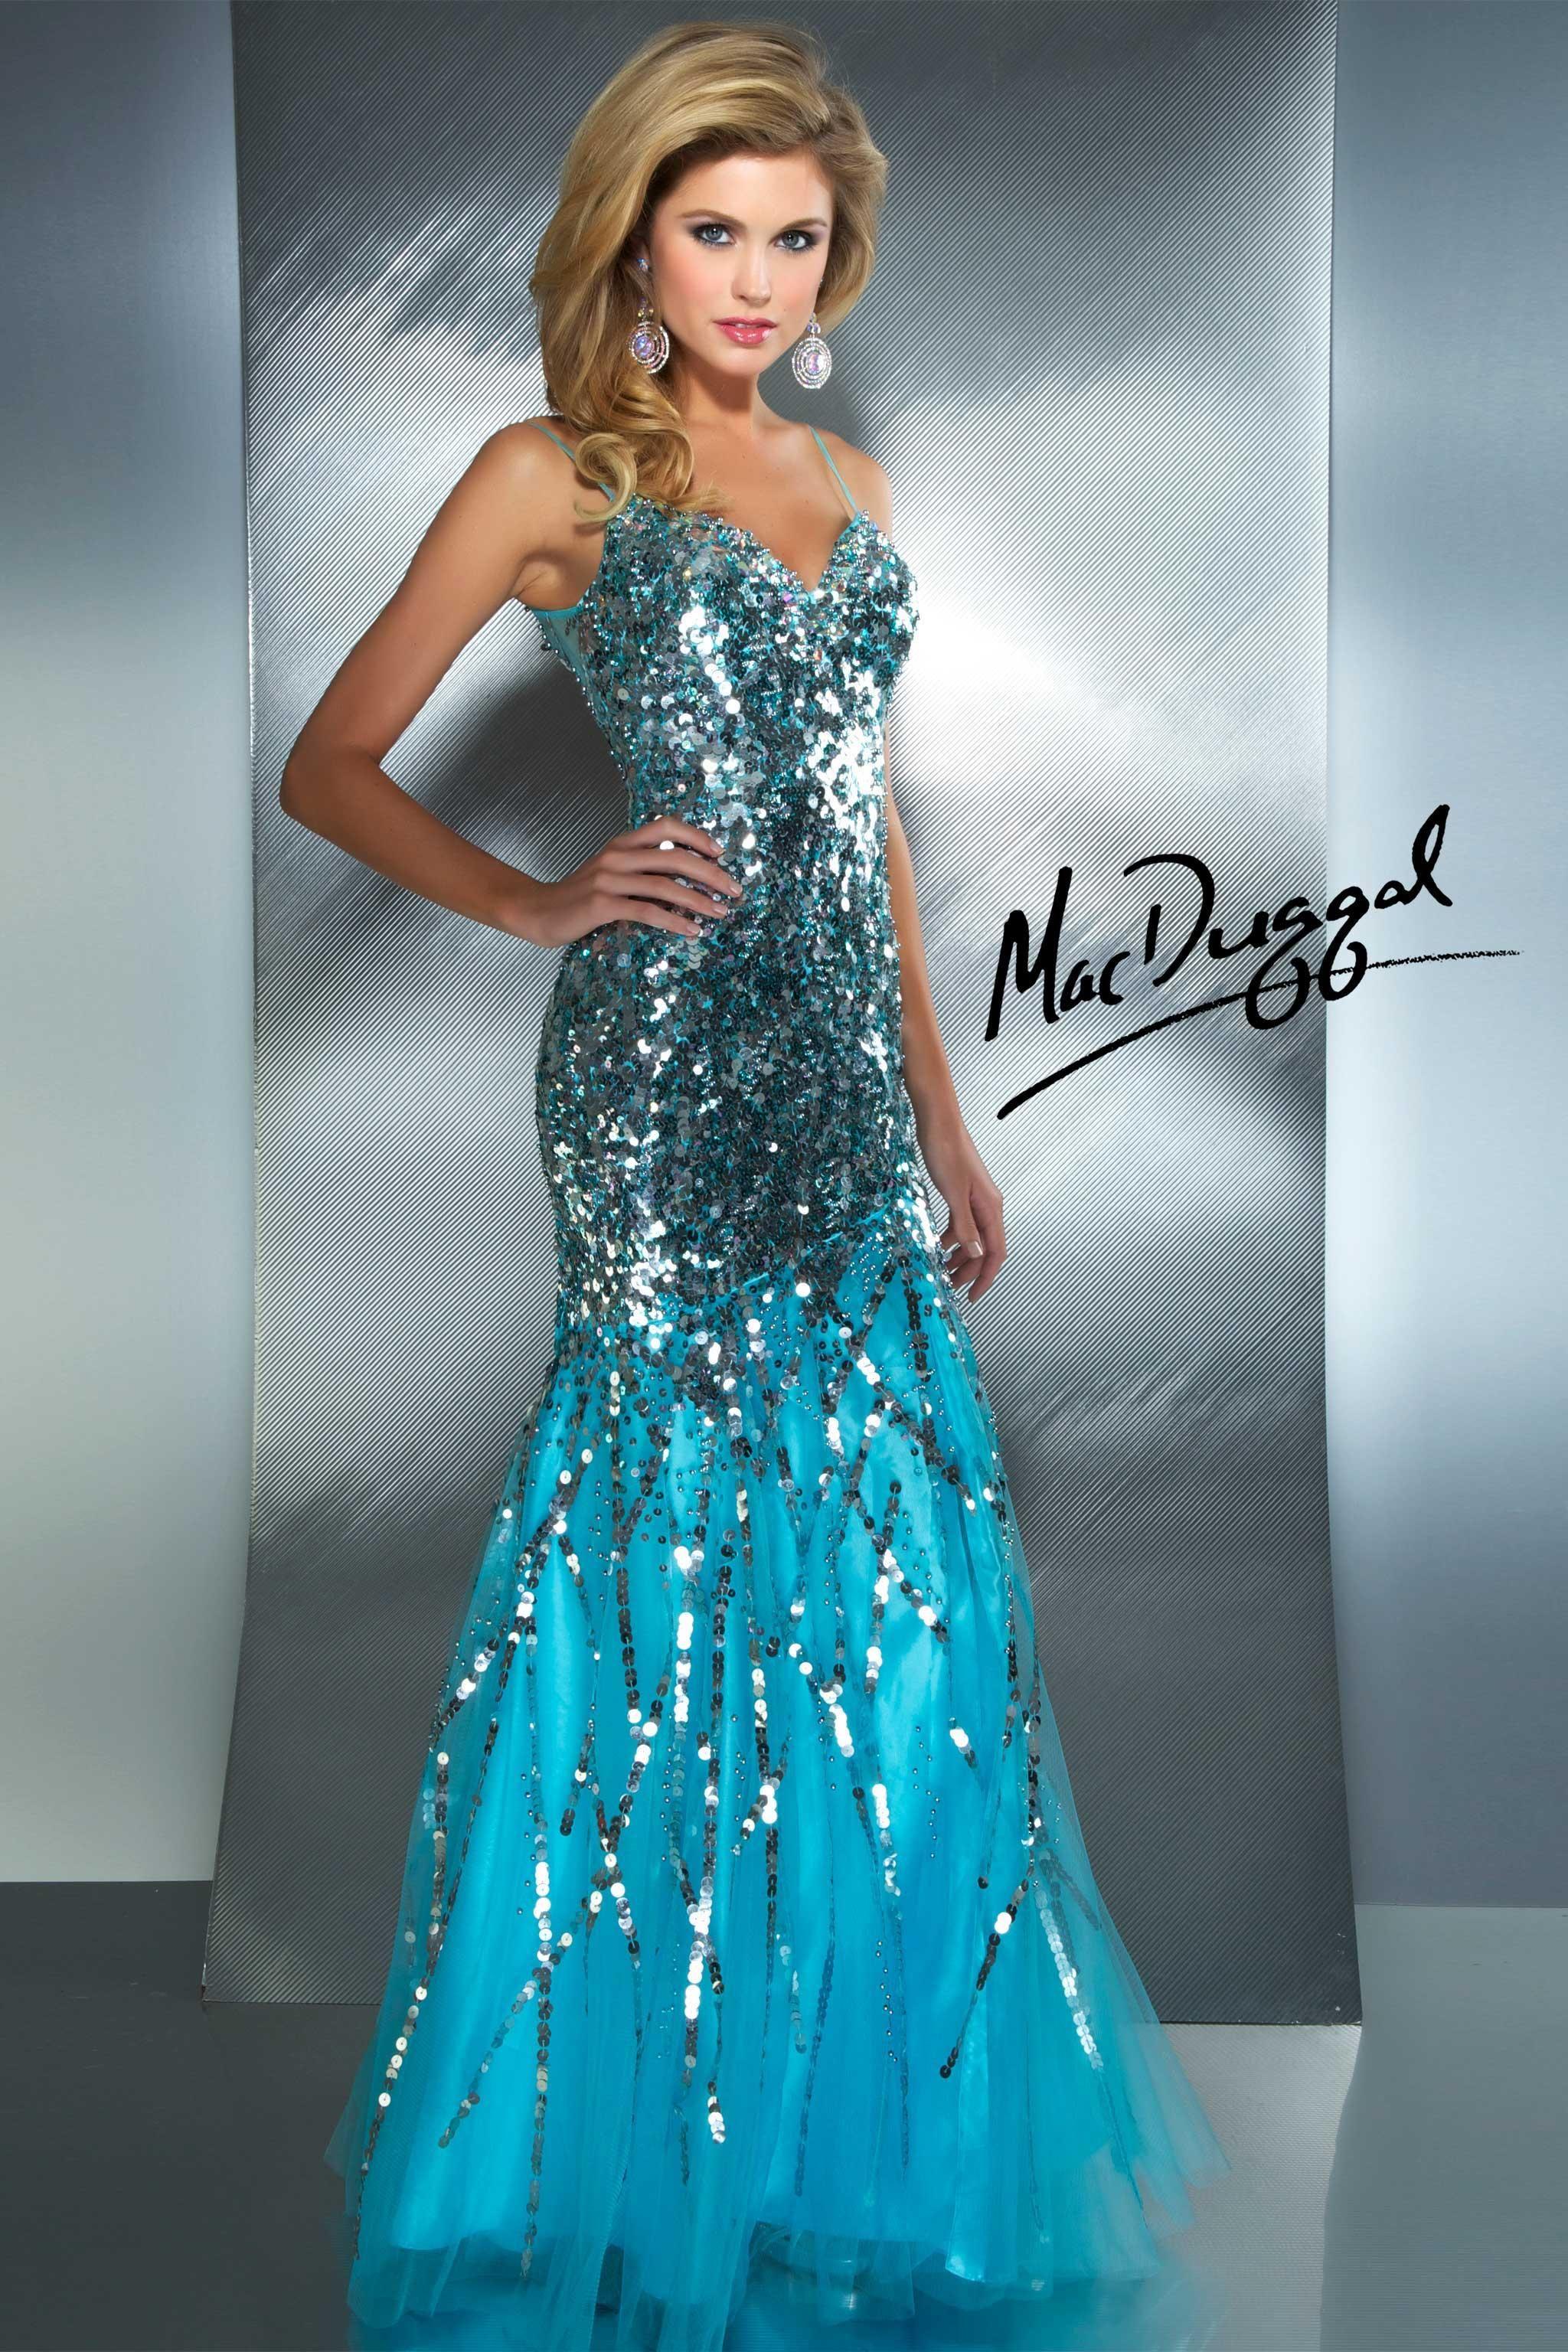 85094M | Mac Duggal | Prom pics | Pinterest | Macs, Prom and Dream dress